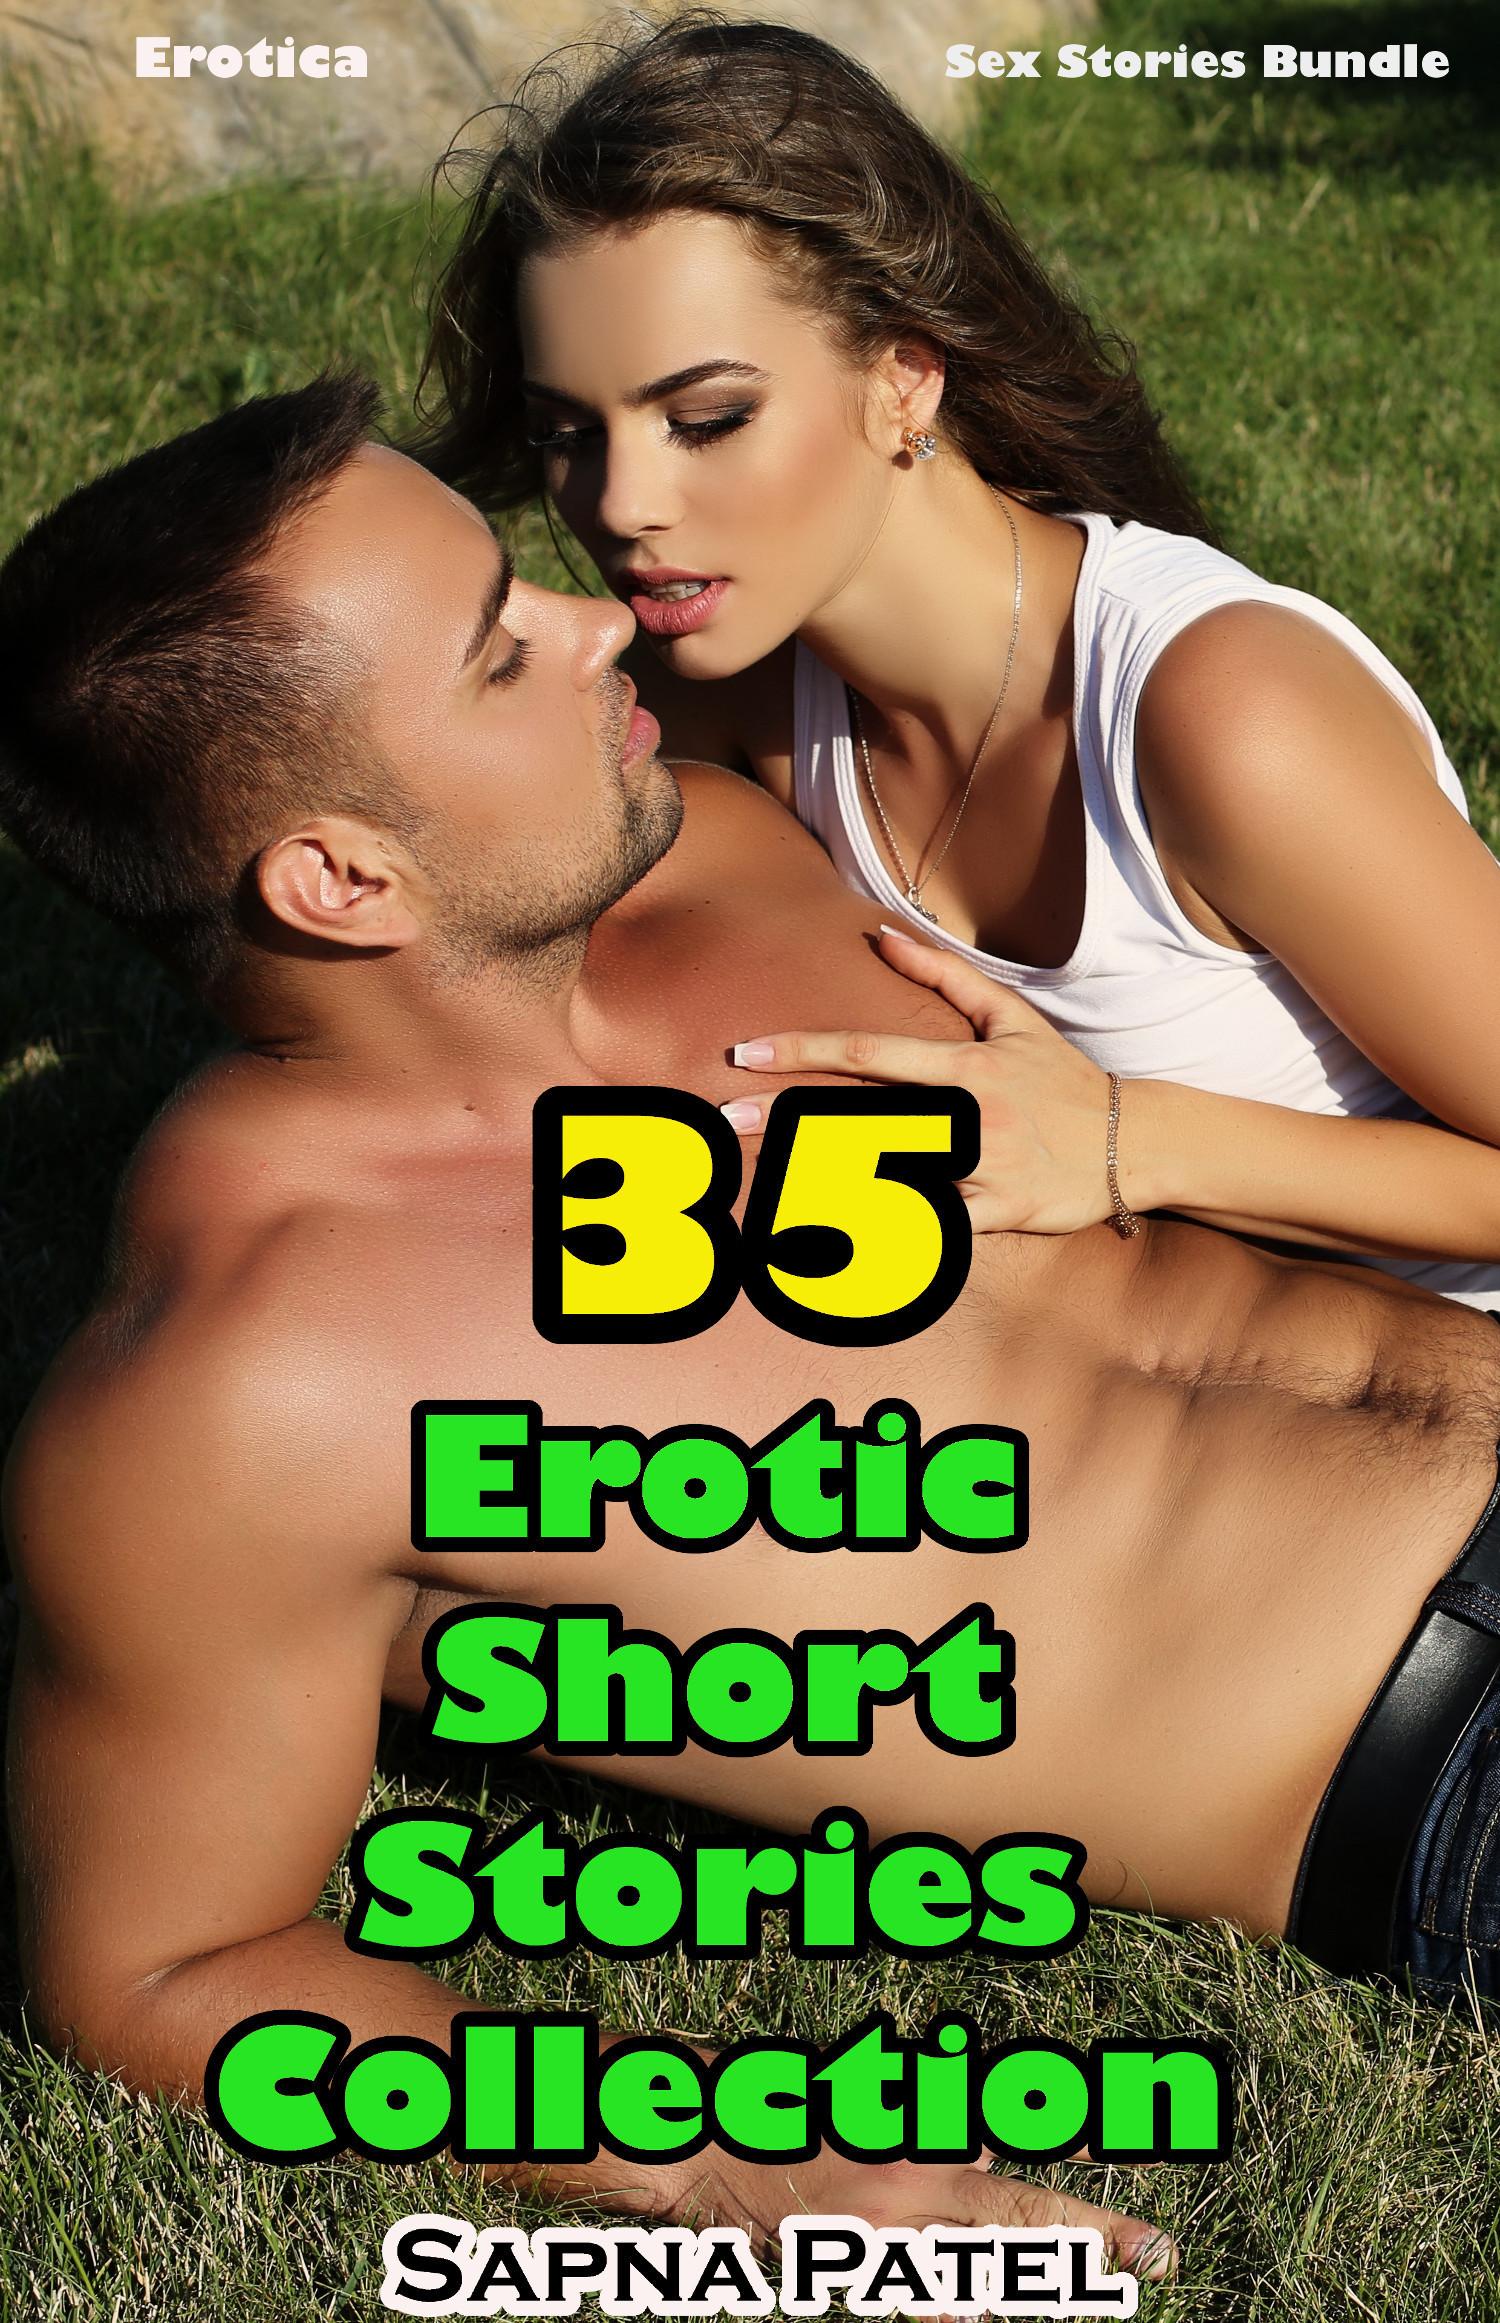 Erotica: 35 Erotic Short Stories Collection Sex Stories Bundle  by  Sapna Patel